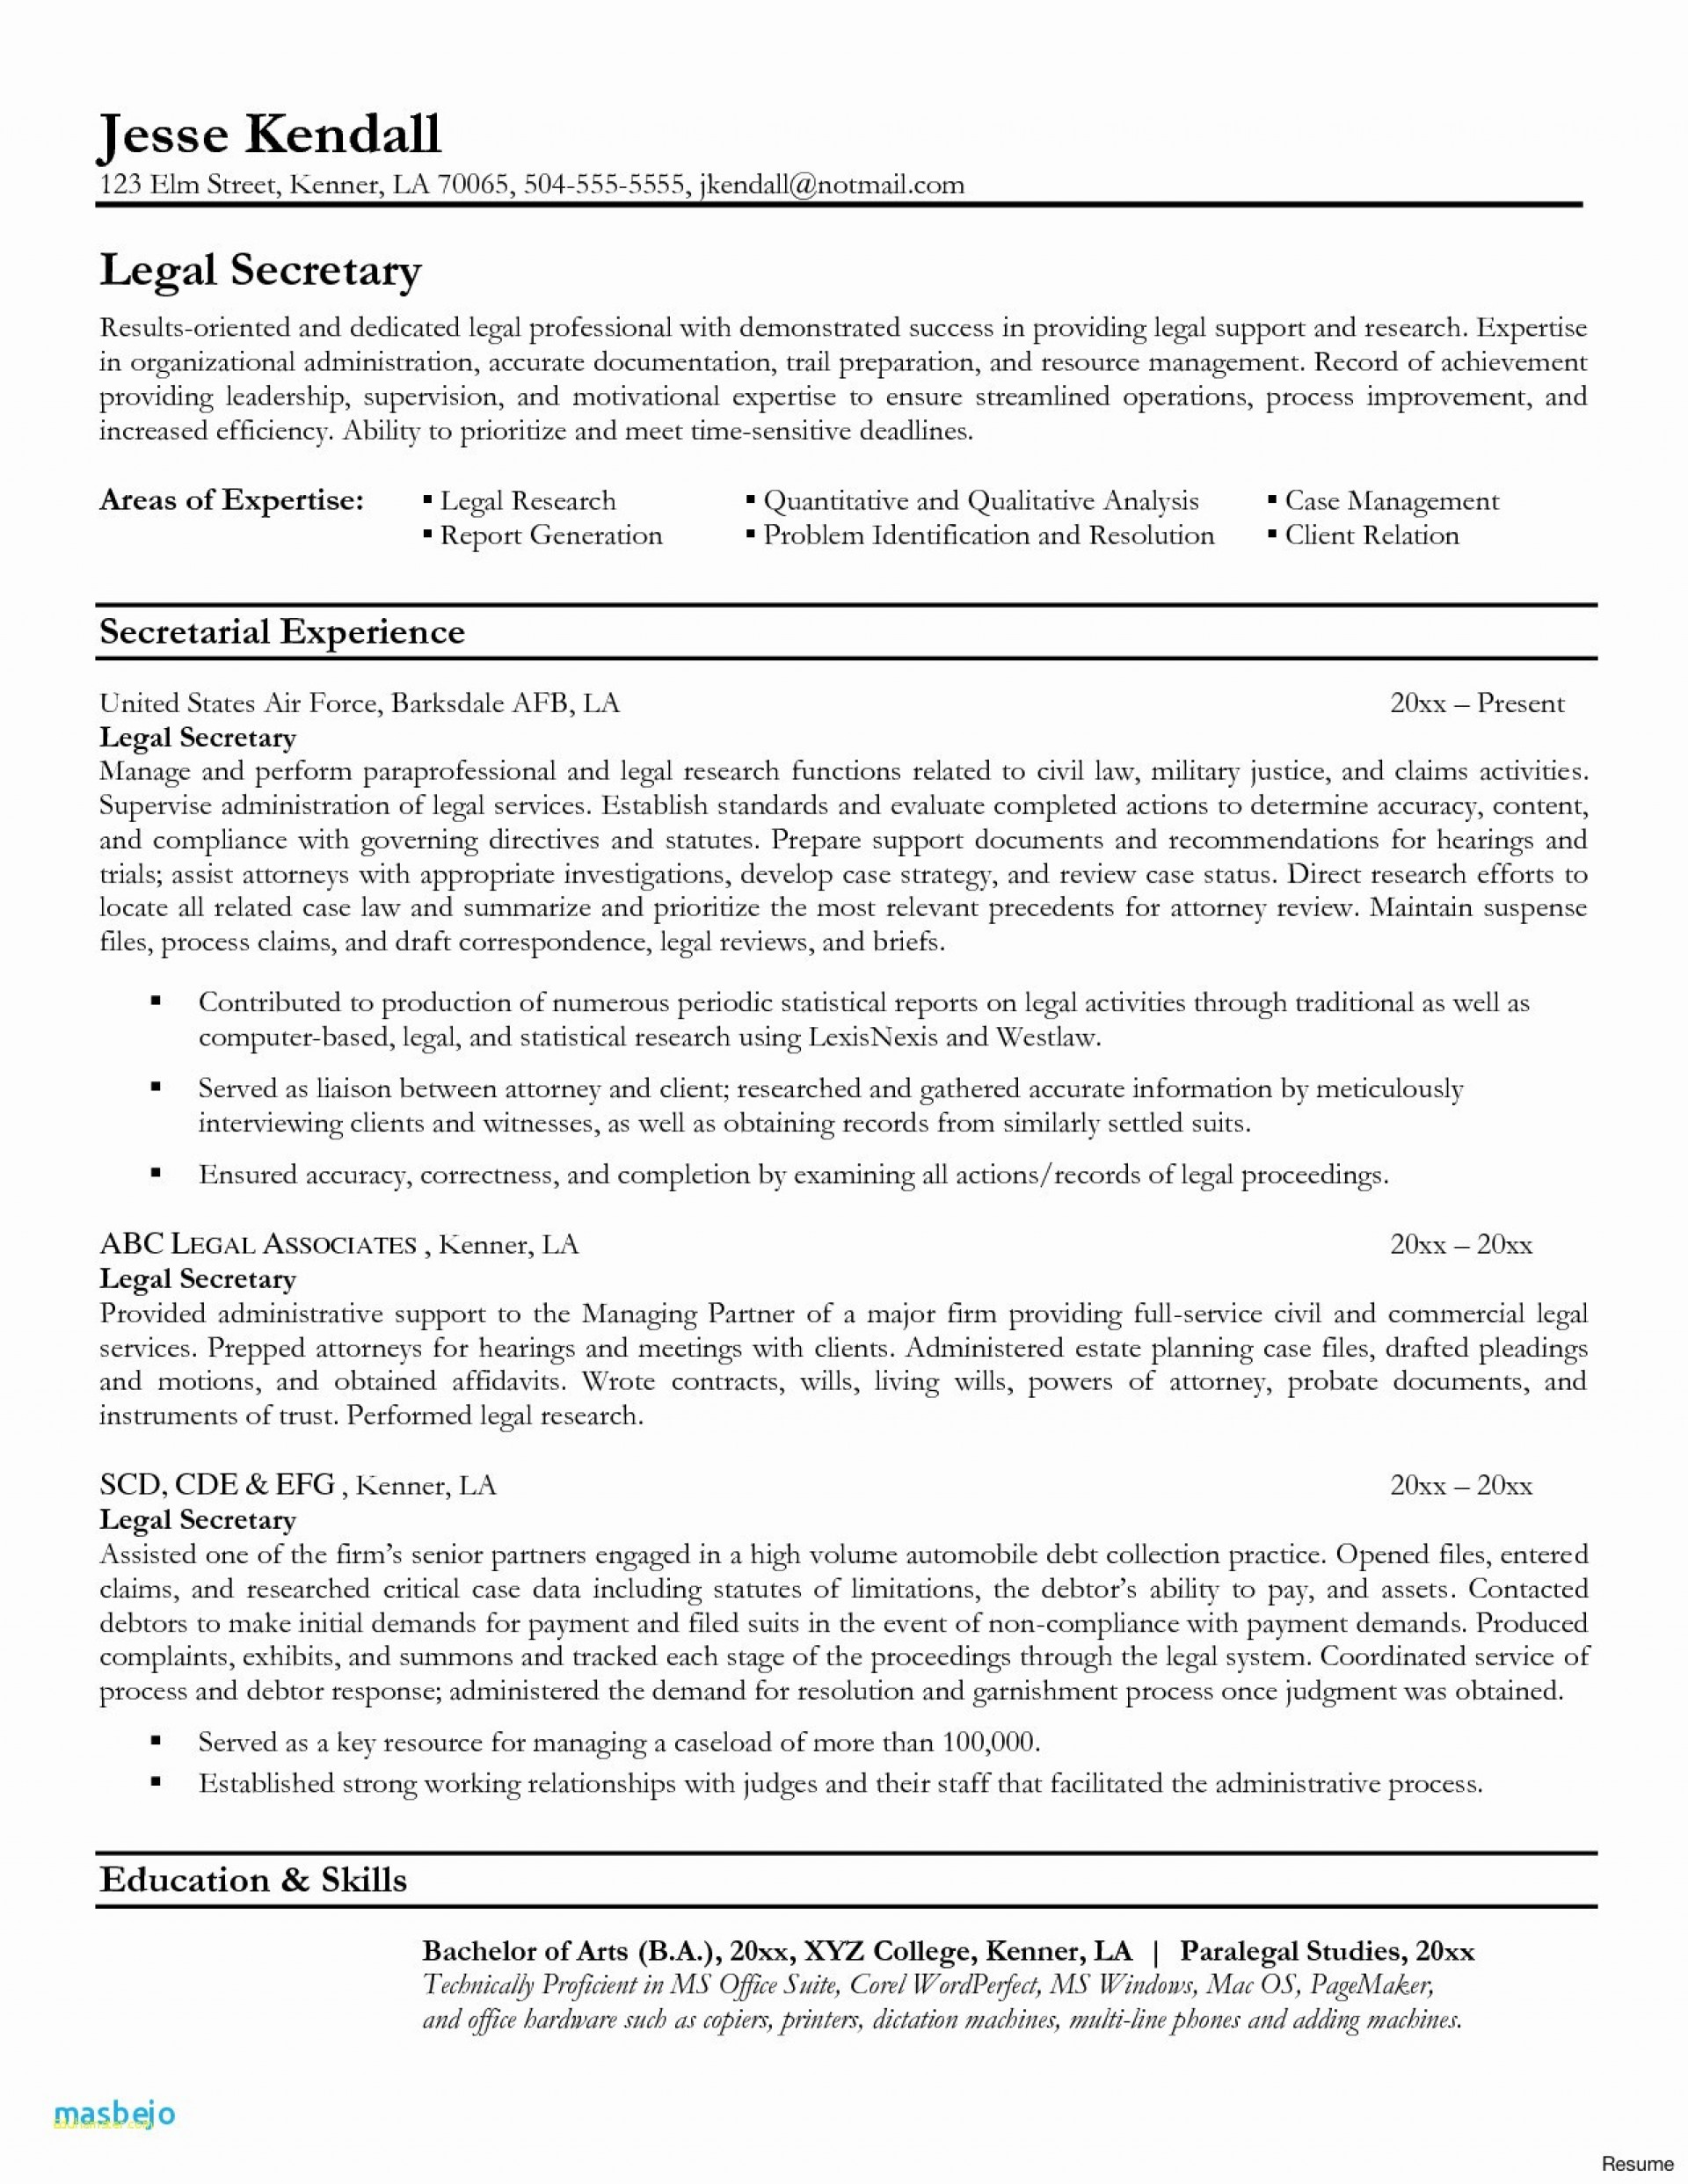 013 Copyright Laws In Education Best Of Unique Life Essays Impressive Essay Examples 2012 1920